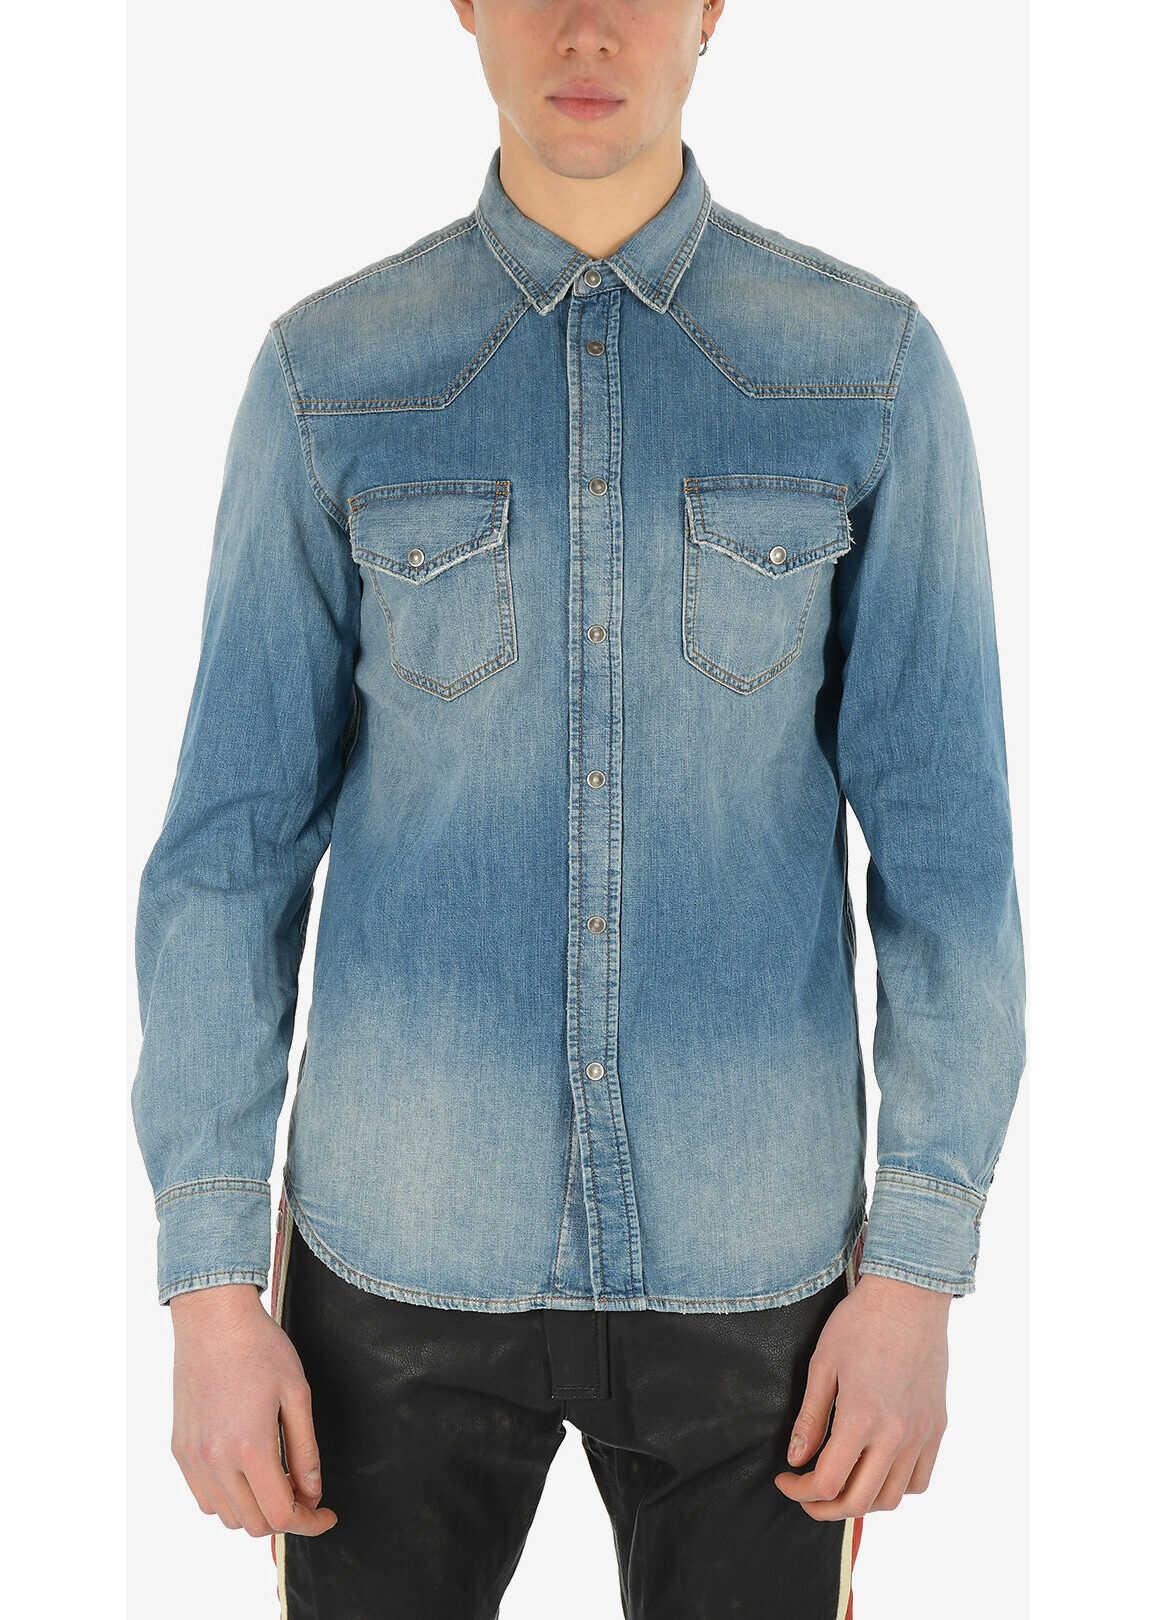 Diesel Stonewashed Denim D-EAST-W Shirt with Snap Button BLUE imagine